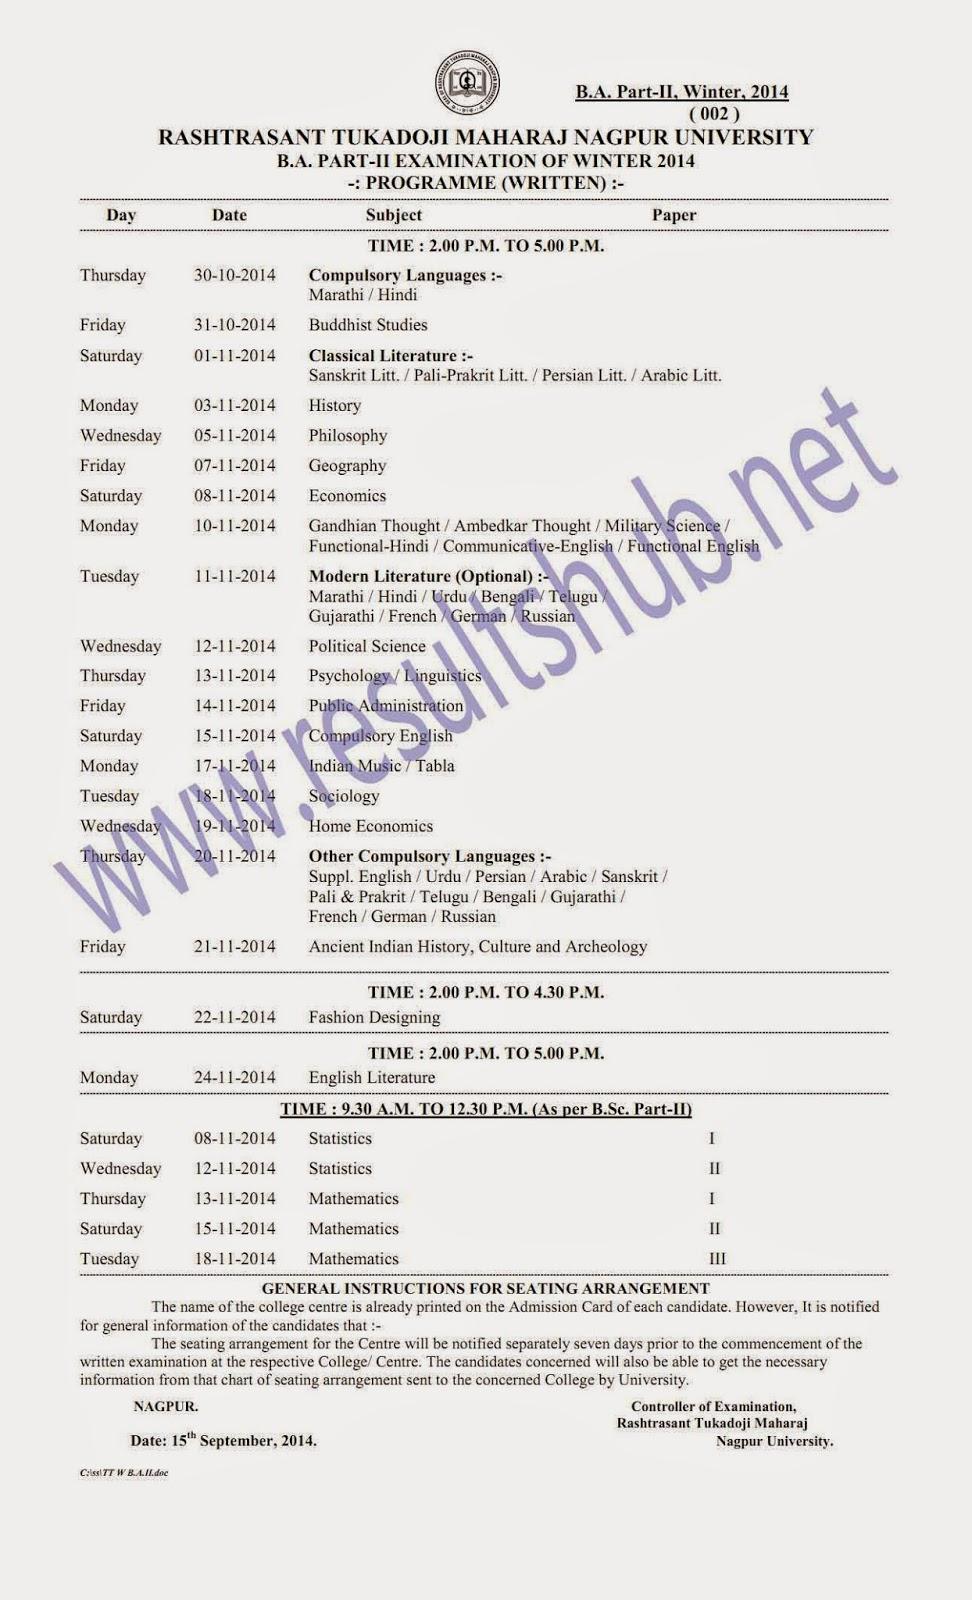 RTMNU-BA-Part-2-Winter-2014-Timetable